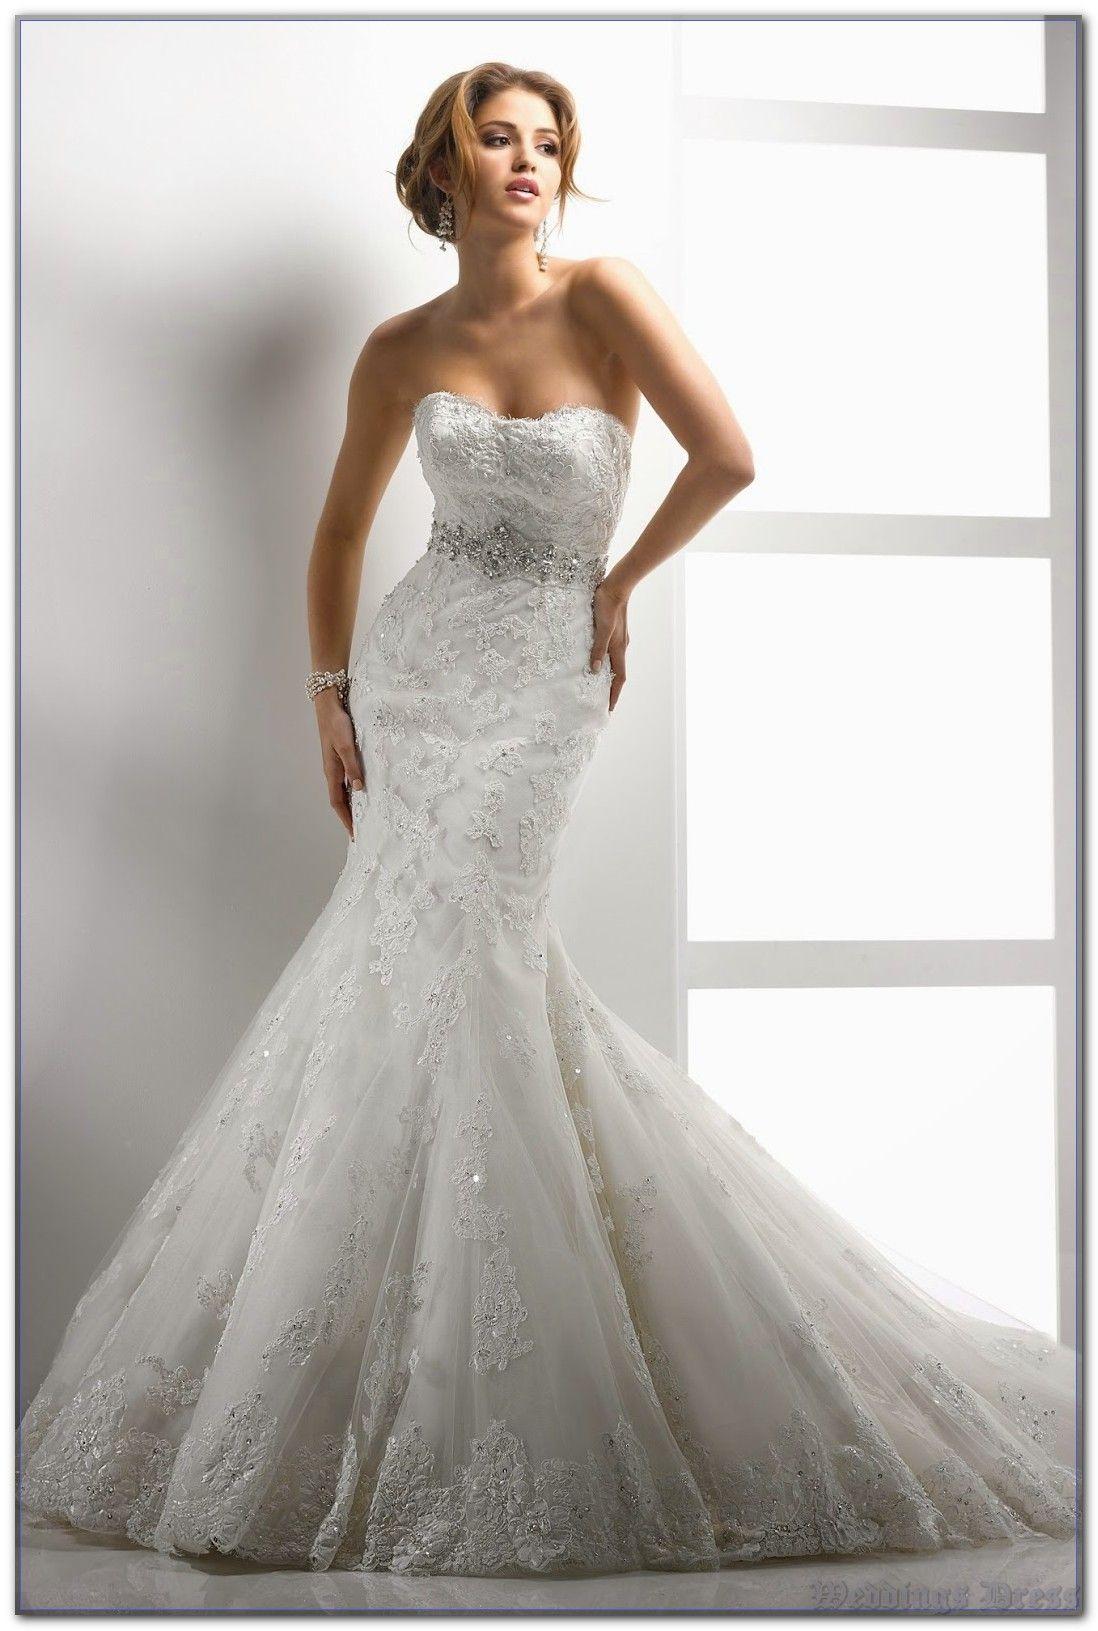 The Secret Of Weddings Dress